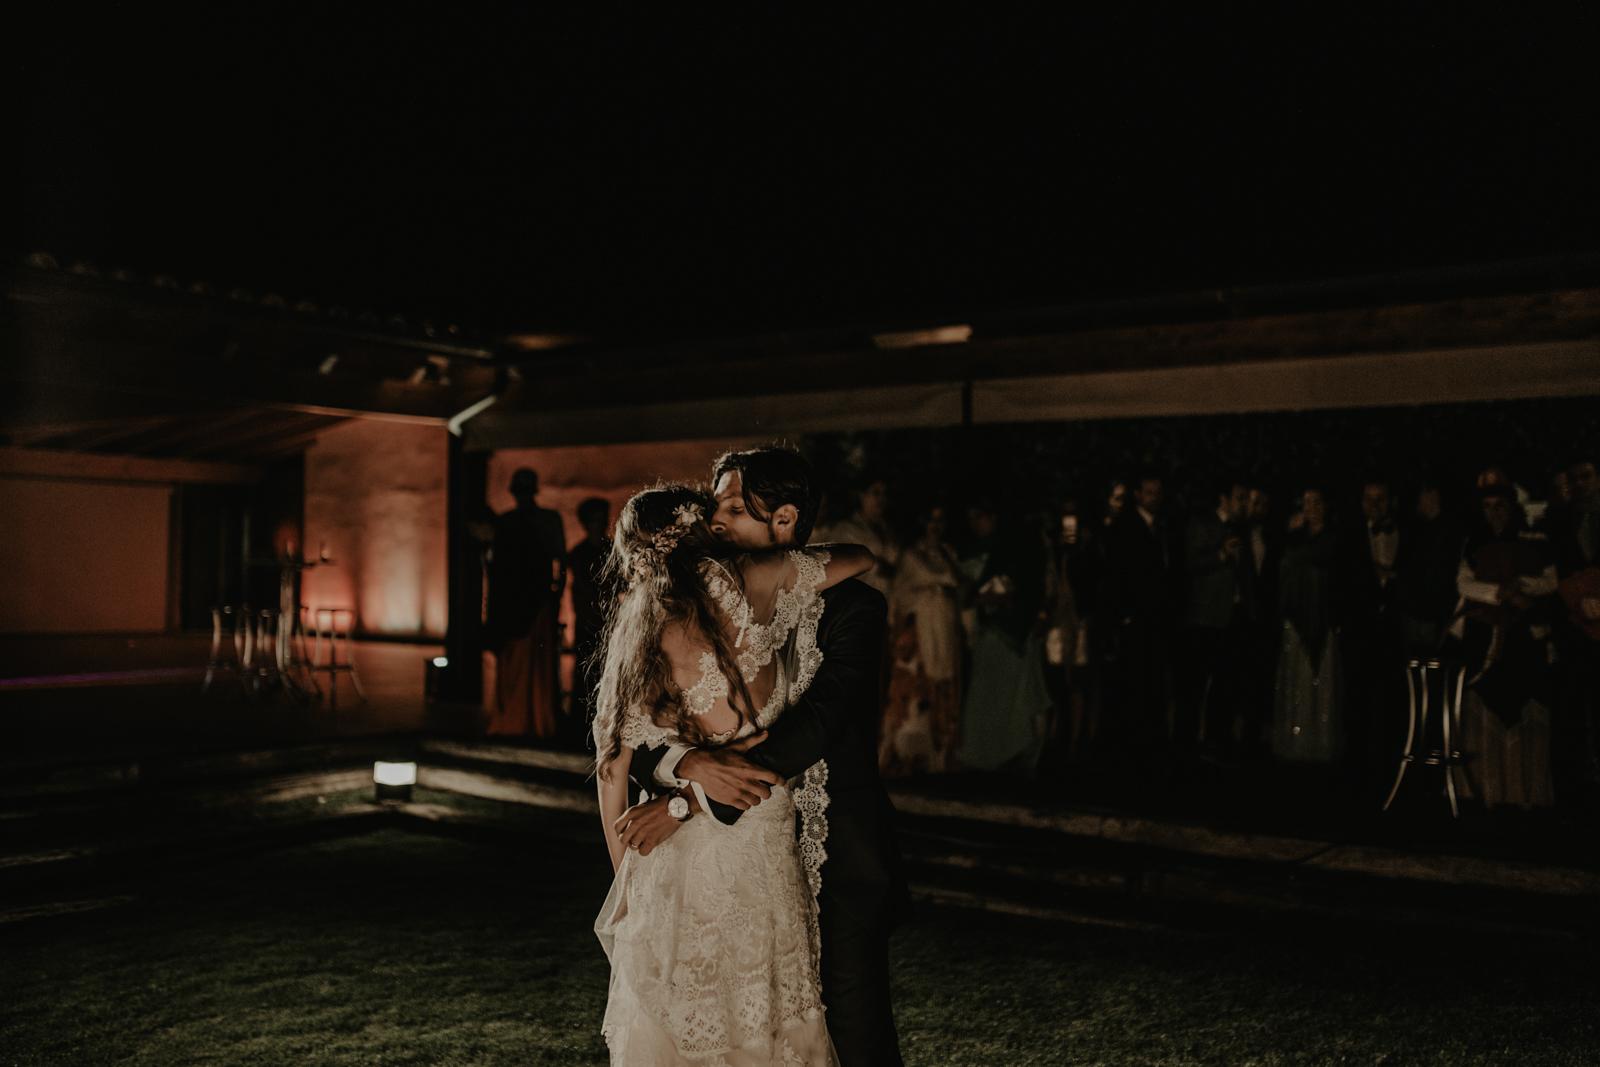 thenortherngirlphotography_photography_thenortherngirl_rebeccascabros_wedding_weddingphotography_weddingphotographer_barcelona_bodaenbarcelona_bodaenmaselmarti_bodarogeryvane-961.jpg